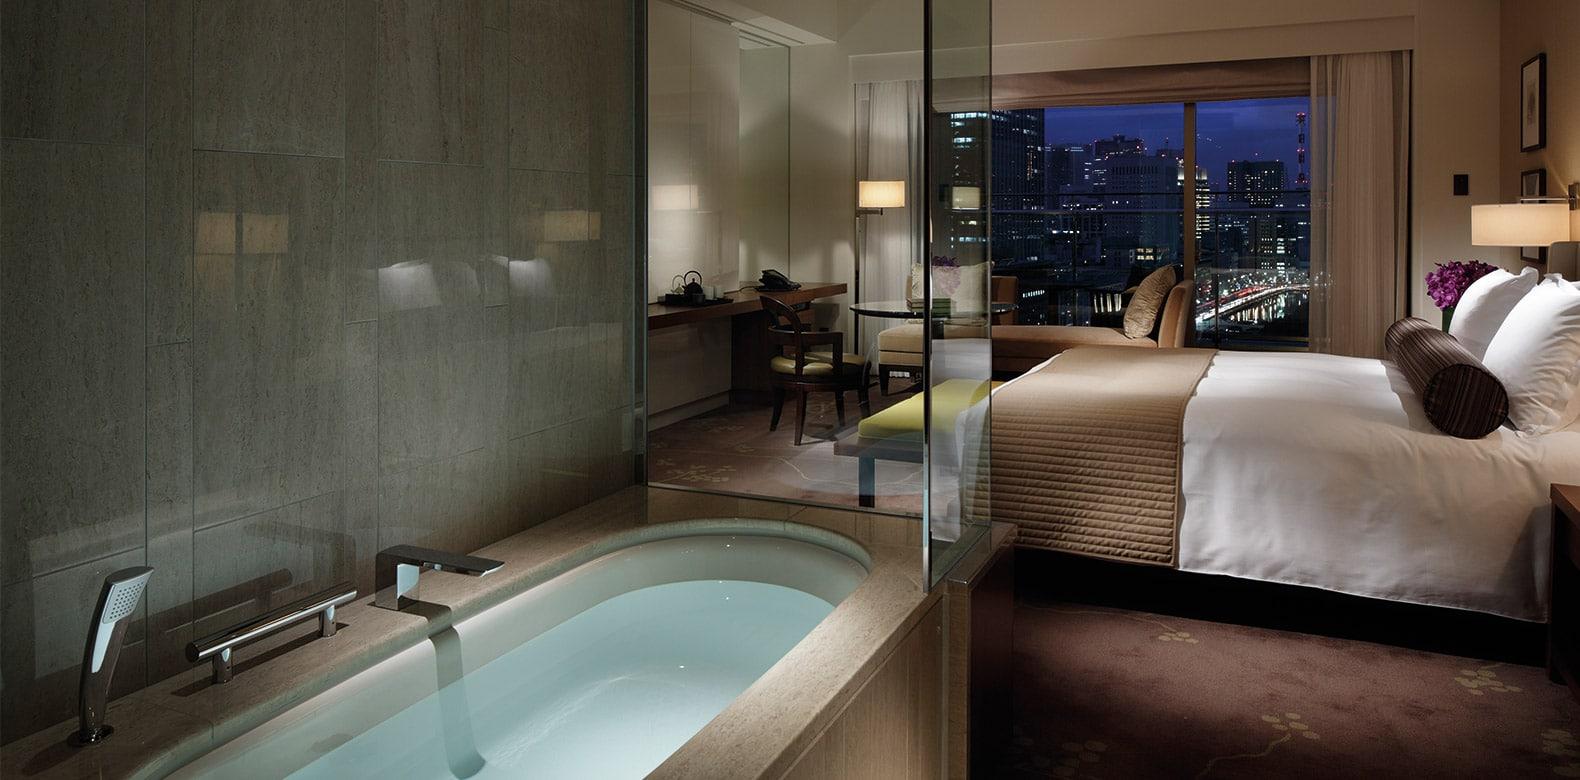 Palace Hotel Tokyo Deluxe Room Bathroom2 Palace Hotel Tokyo